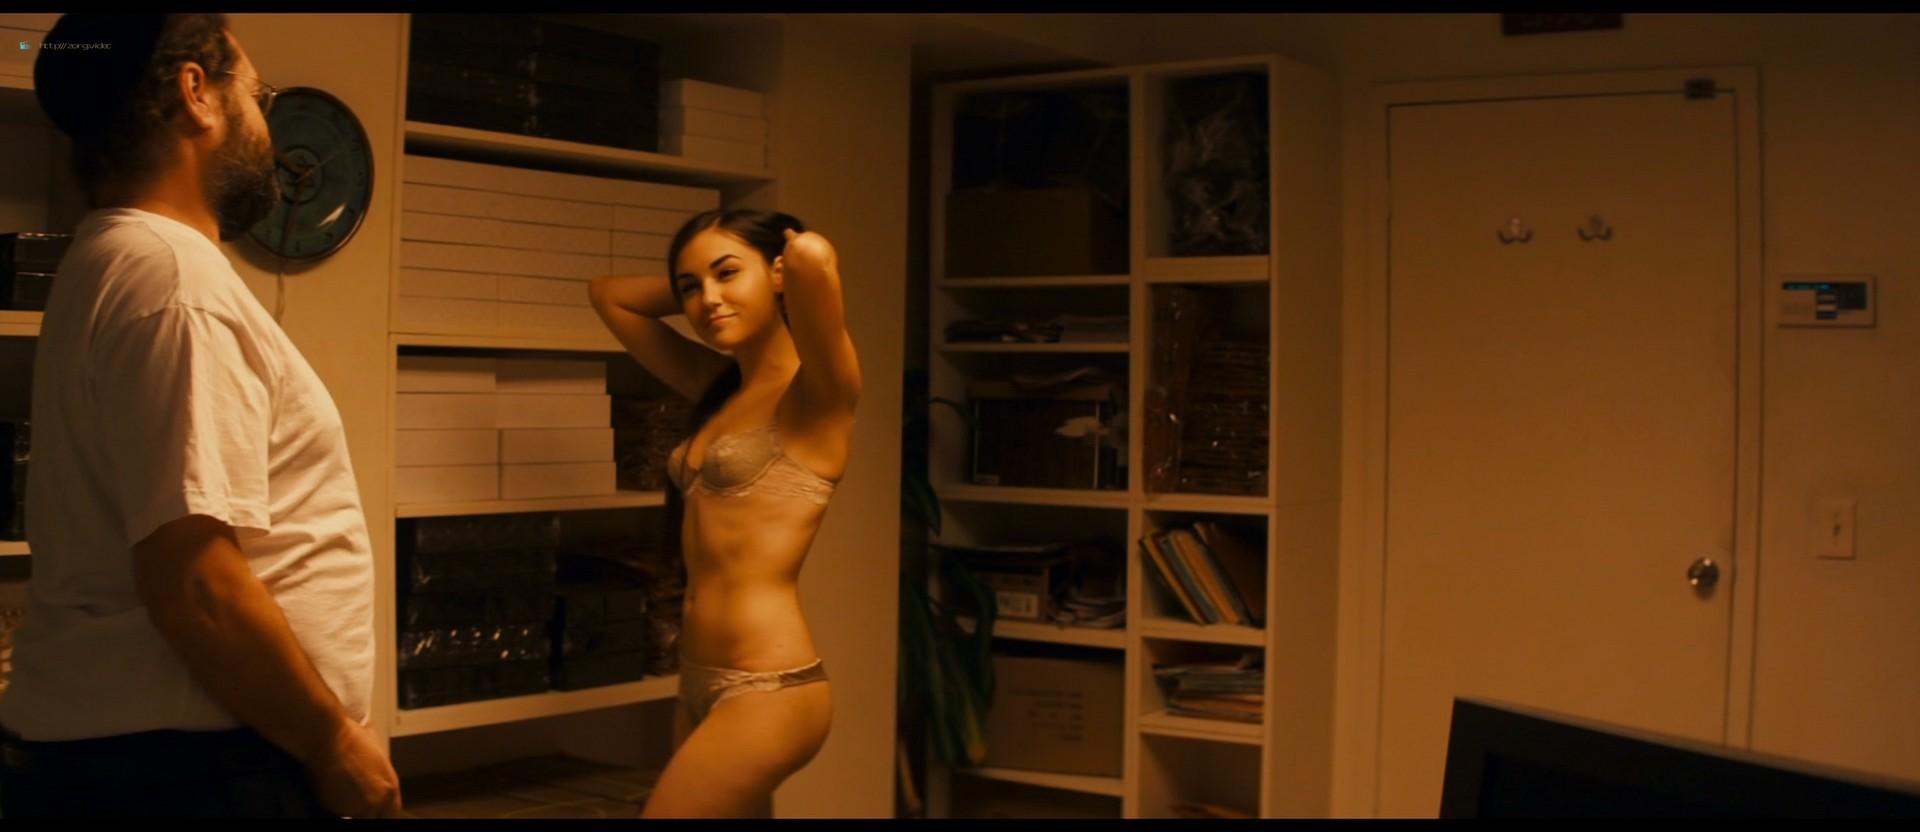 Sasha Grey nude full frontal - The Girlfriend Experience (2009) HD 1080p BluRay (3)